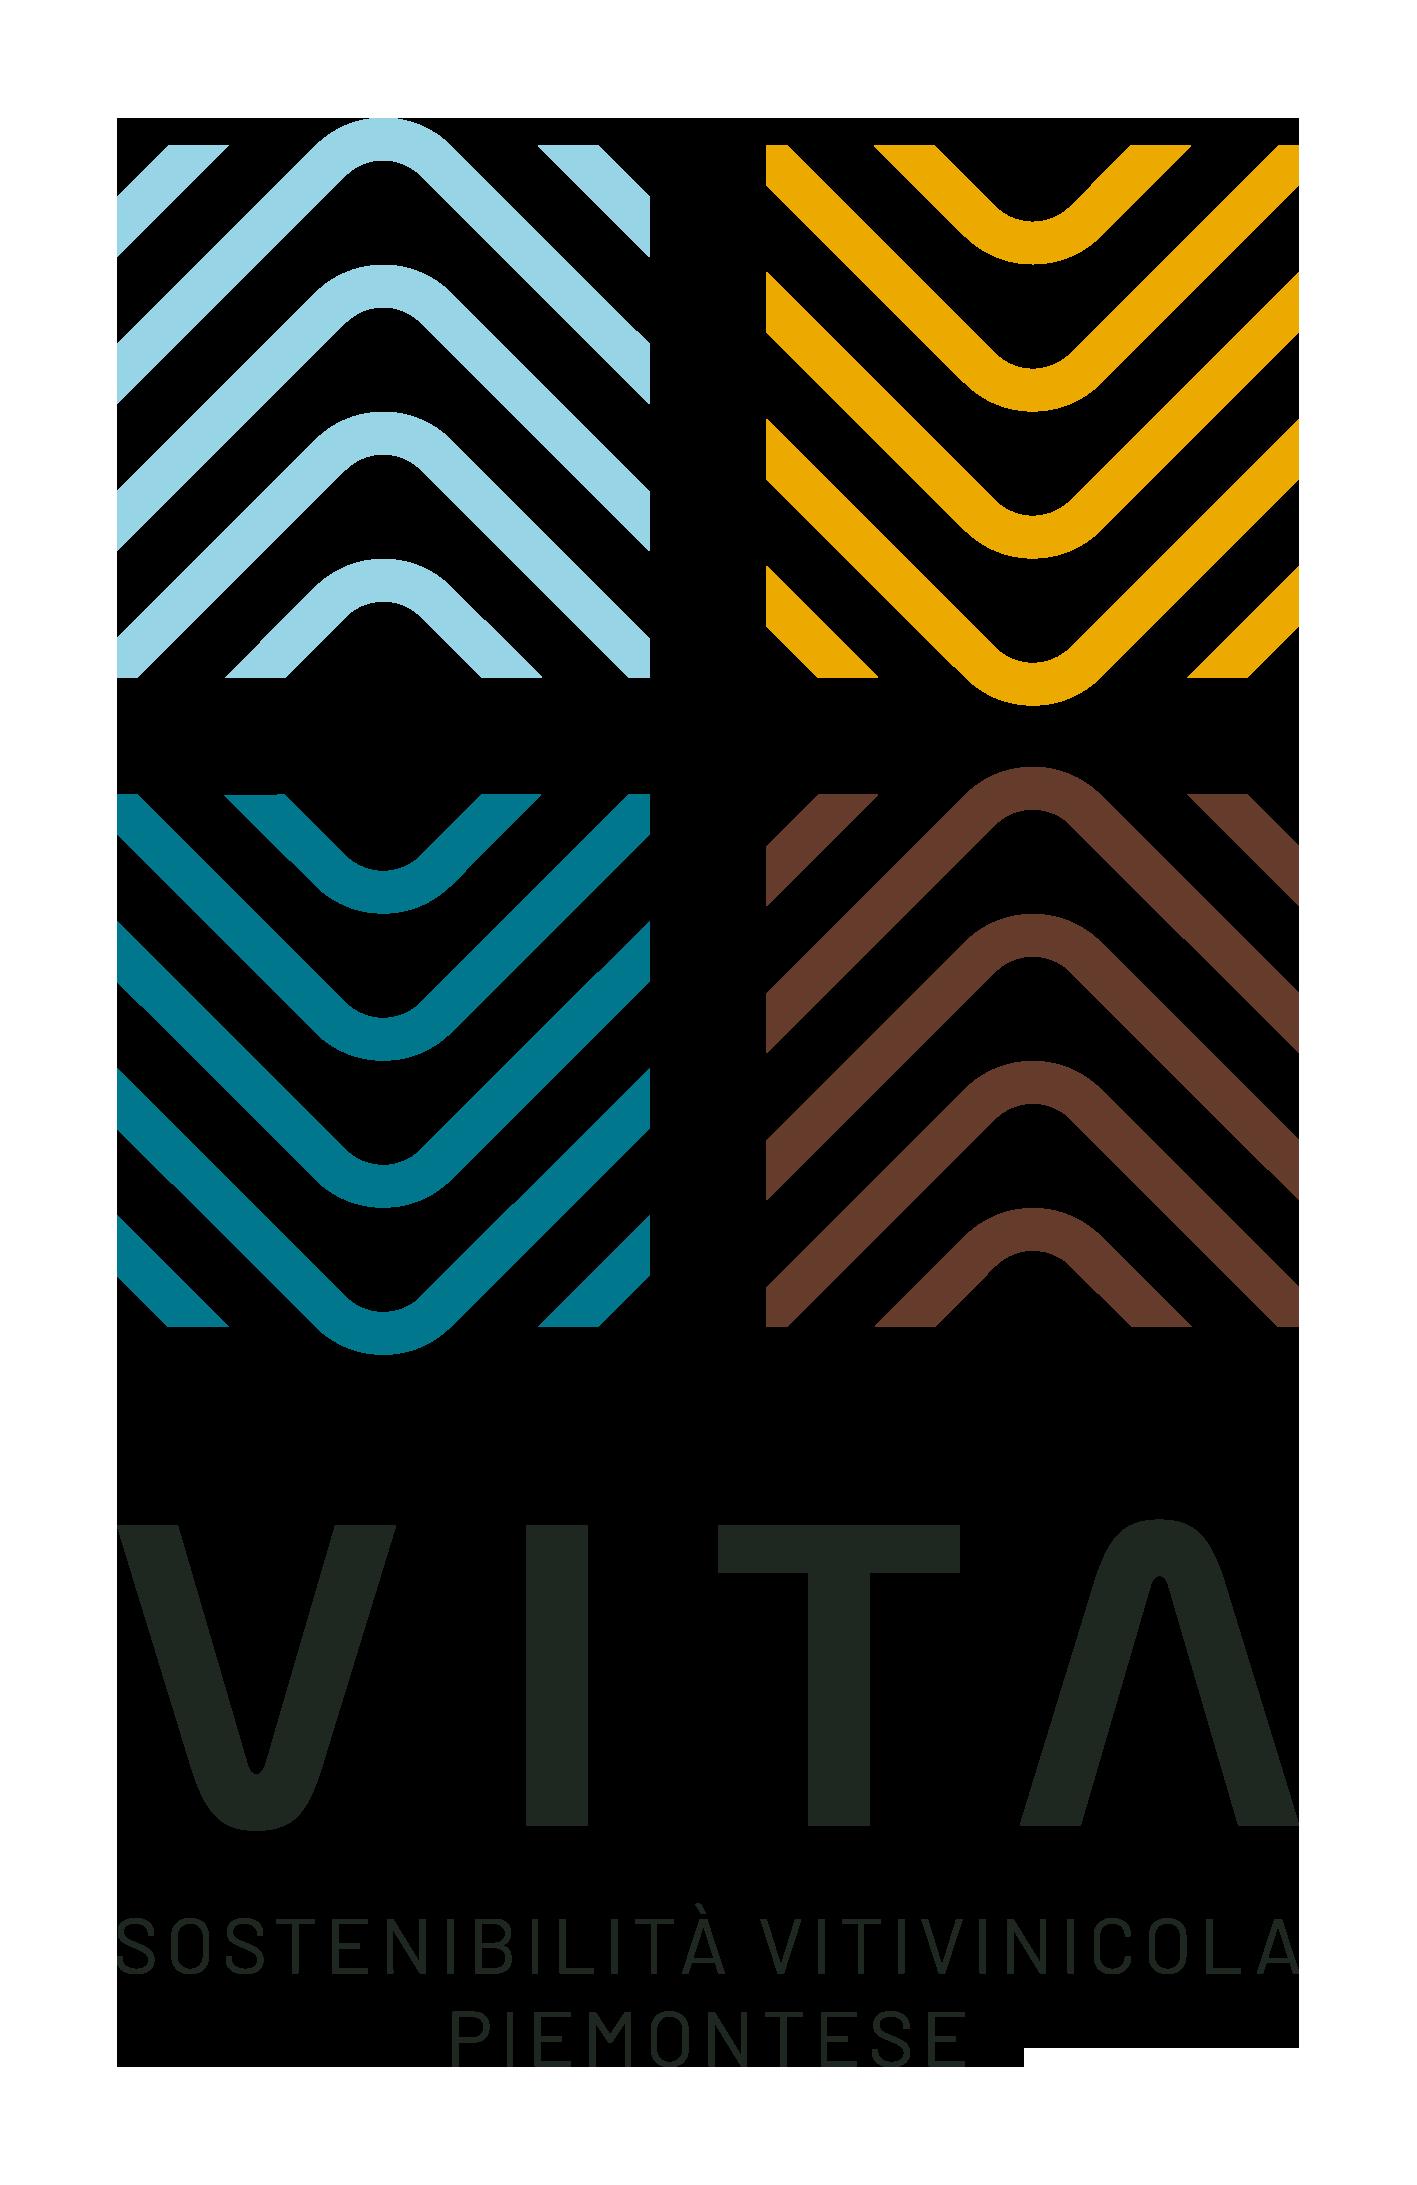 vita_logo_rgb